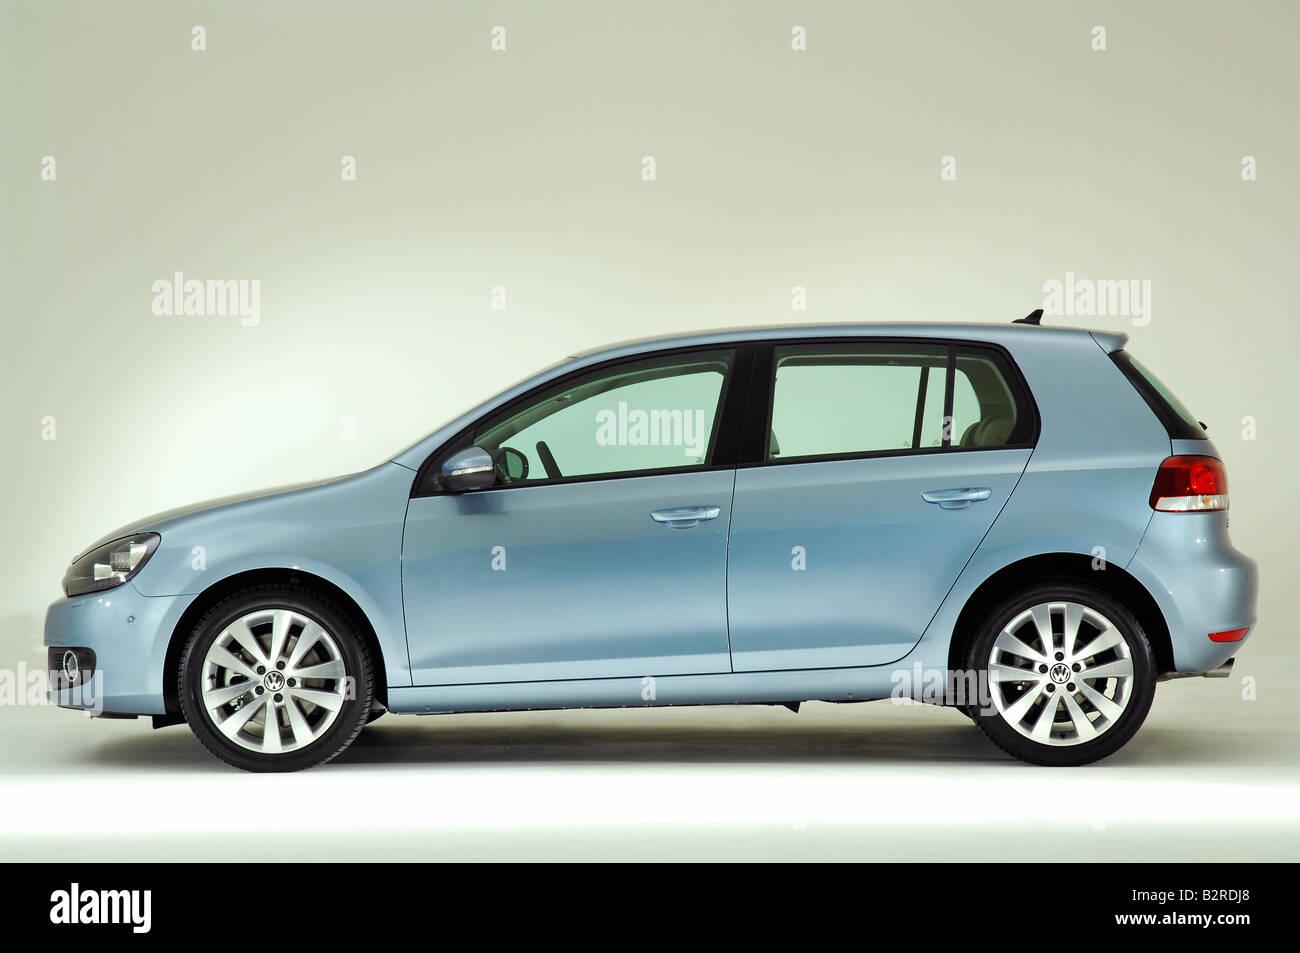 2008 Volkswagen Golf mk VI - Stock Image